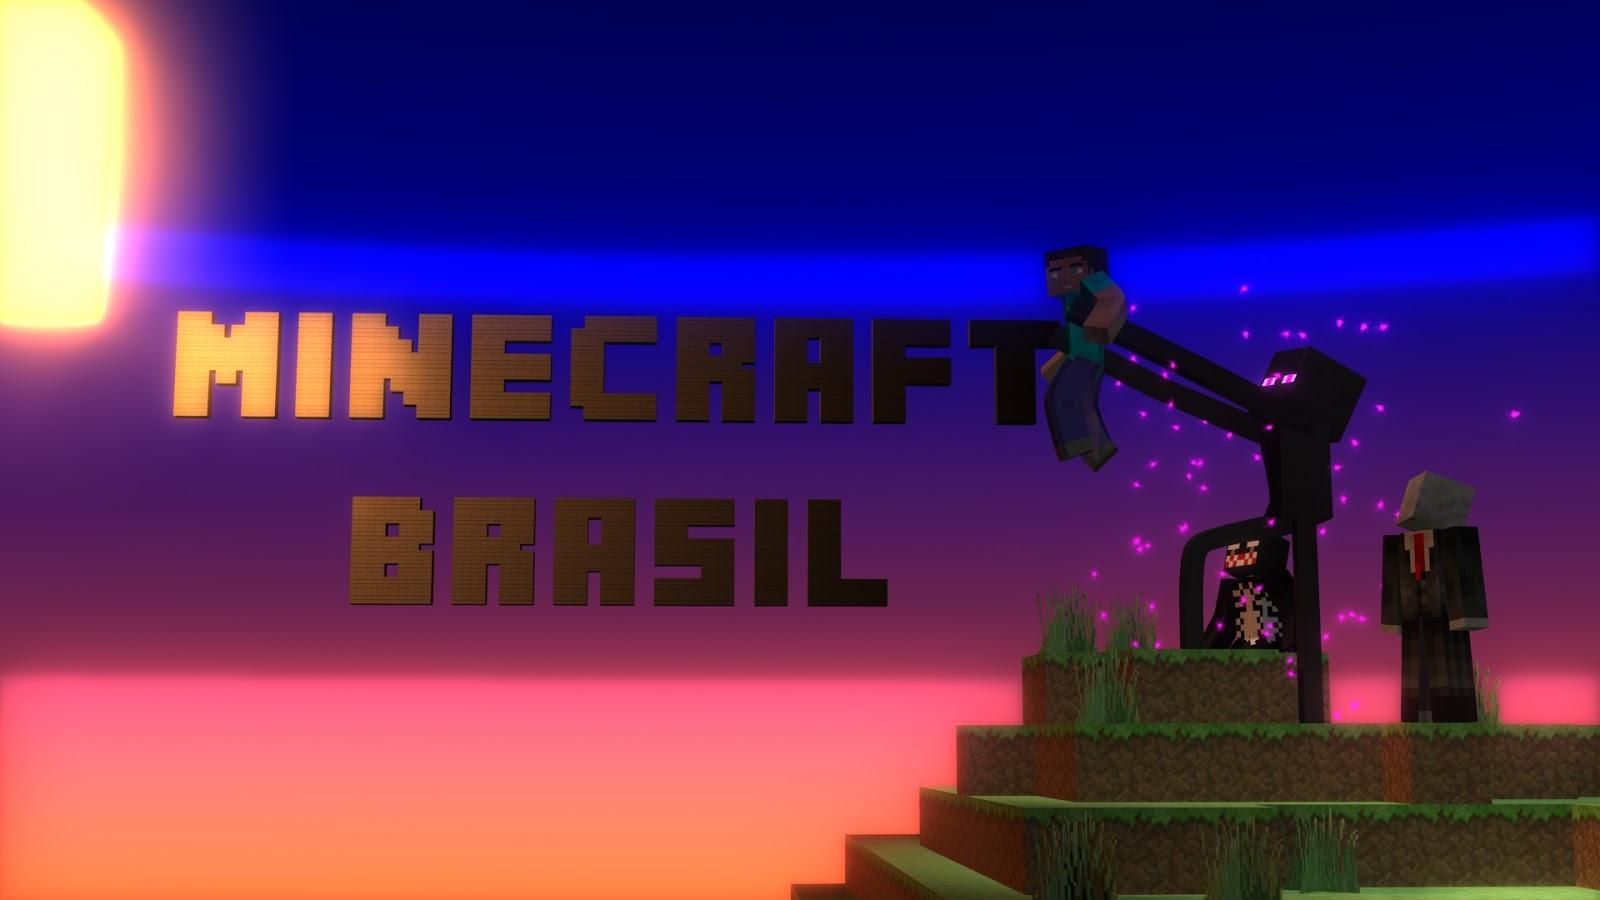 http://1.bp.blogspot.com/-62ezT0jqGr8/UNeu_s1JkcI/AAAAAAAADks/Lf-I-n7mj9A/s1600/Minecraft+Brasil+Page.jpg